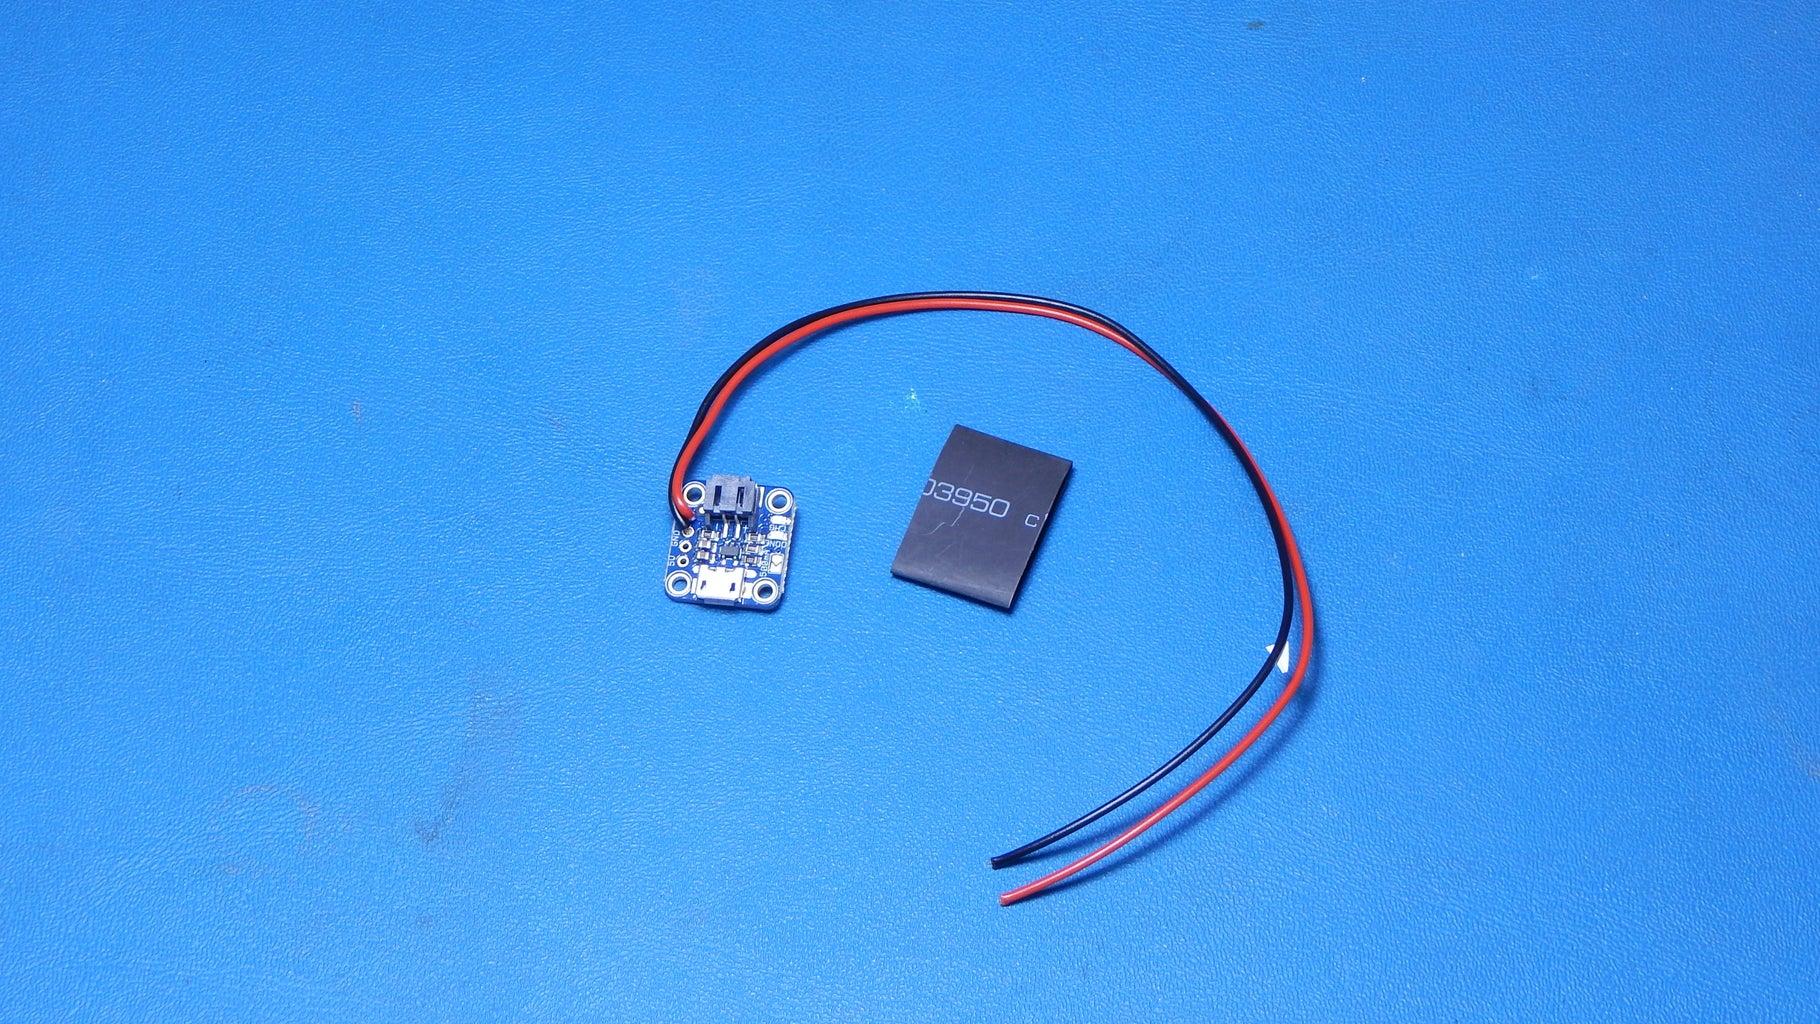 Preparing the Adafruit USB LiIon/LiPoly Charger